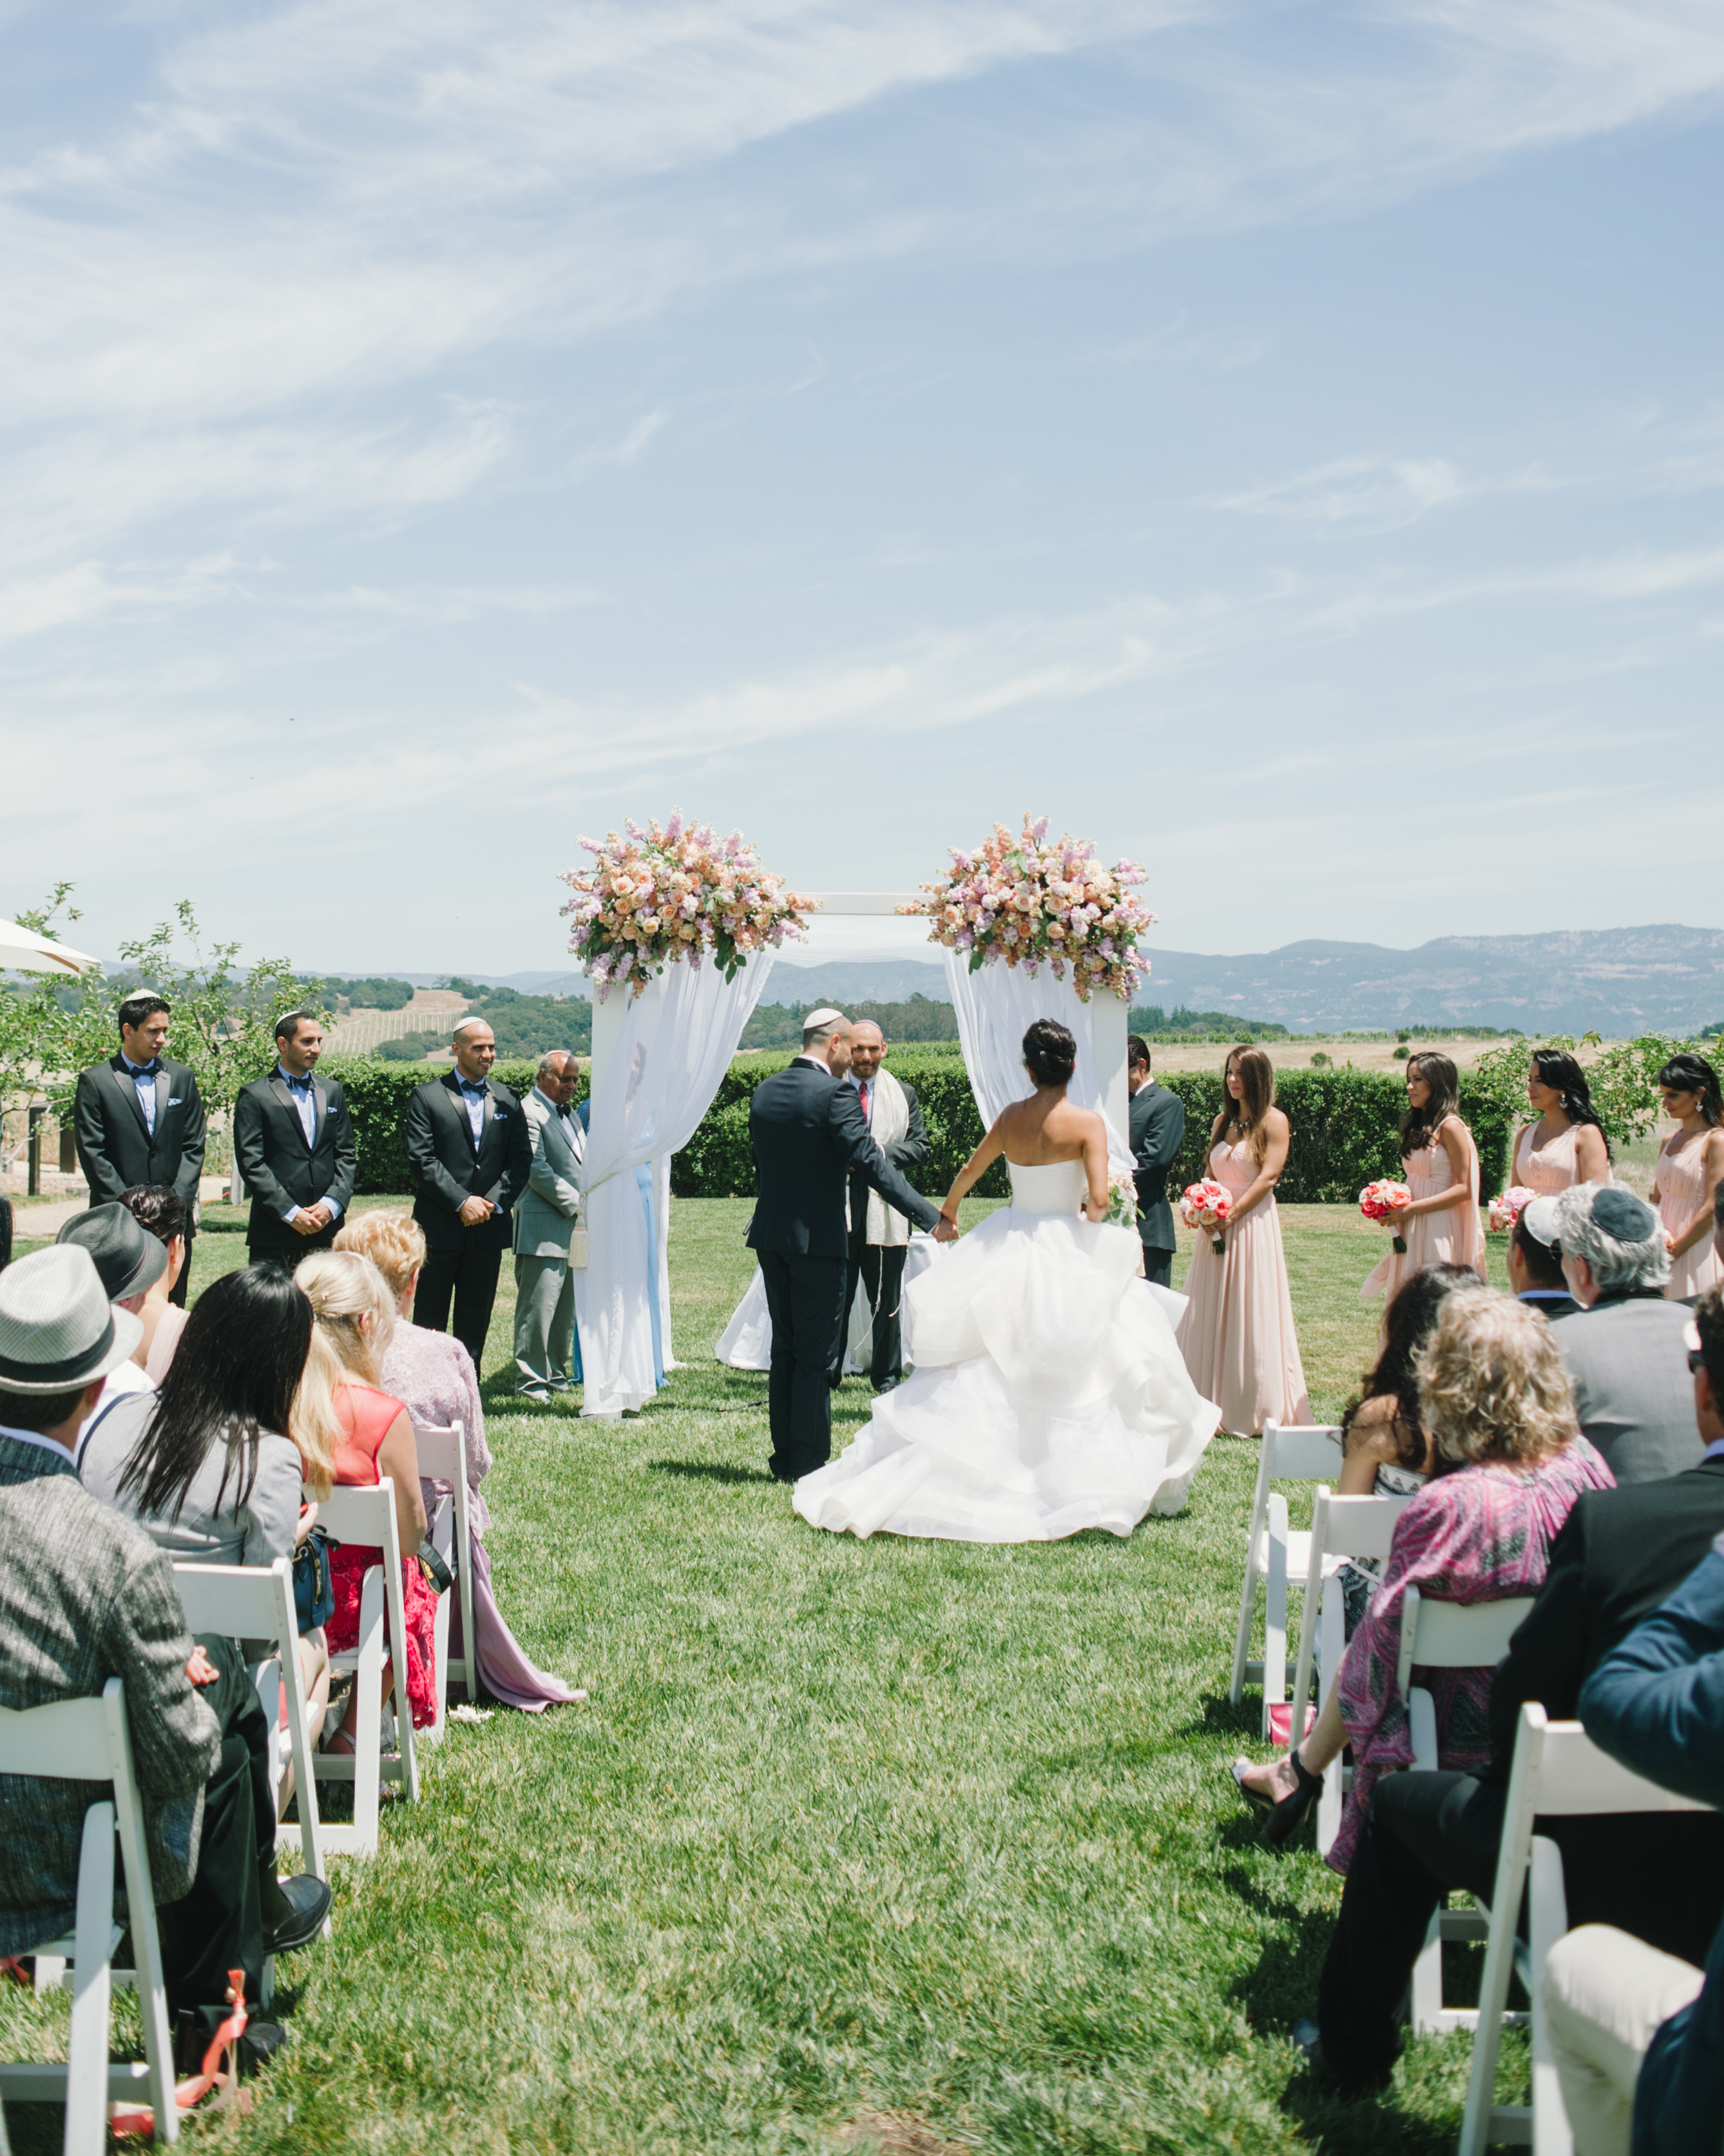 vanessa-joe-wedding-ceremony-11121-s111736-1214.jpg